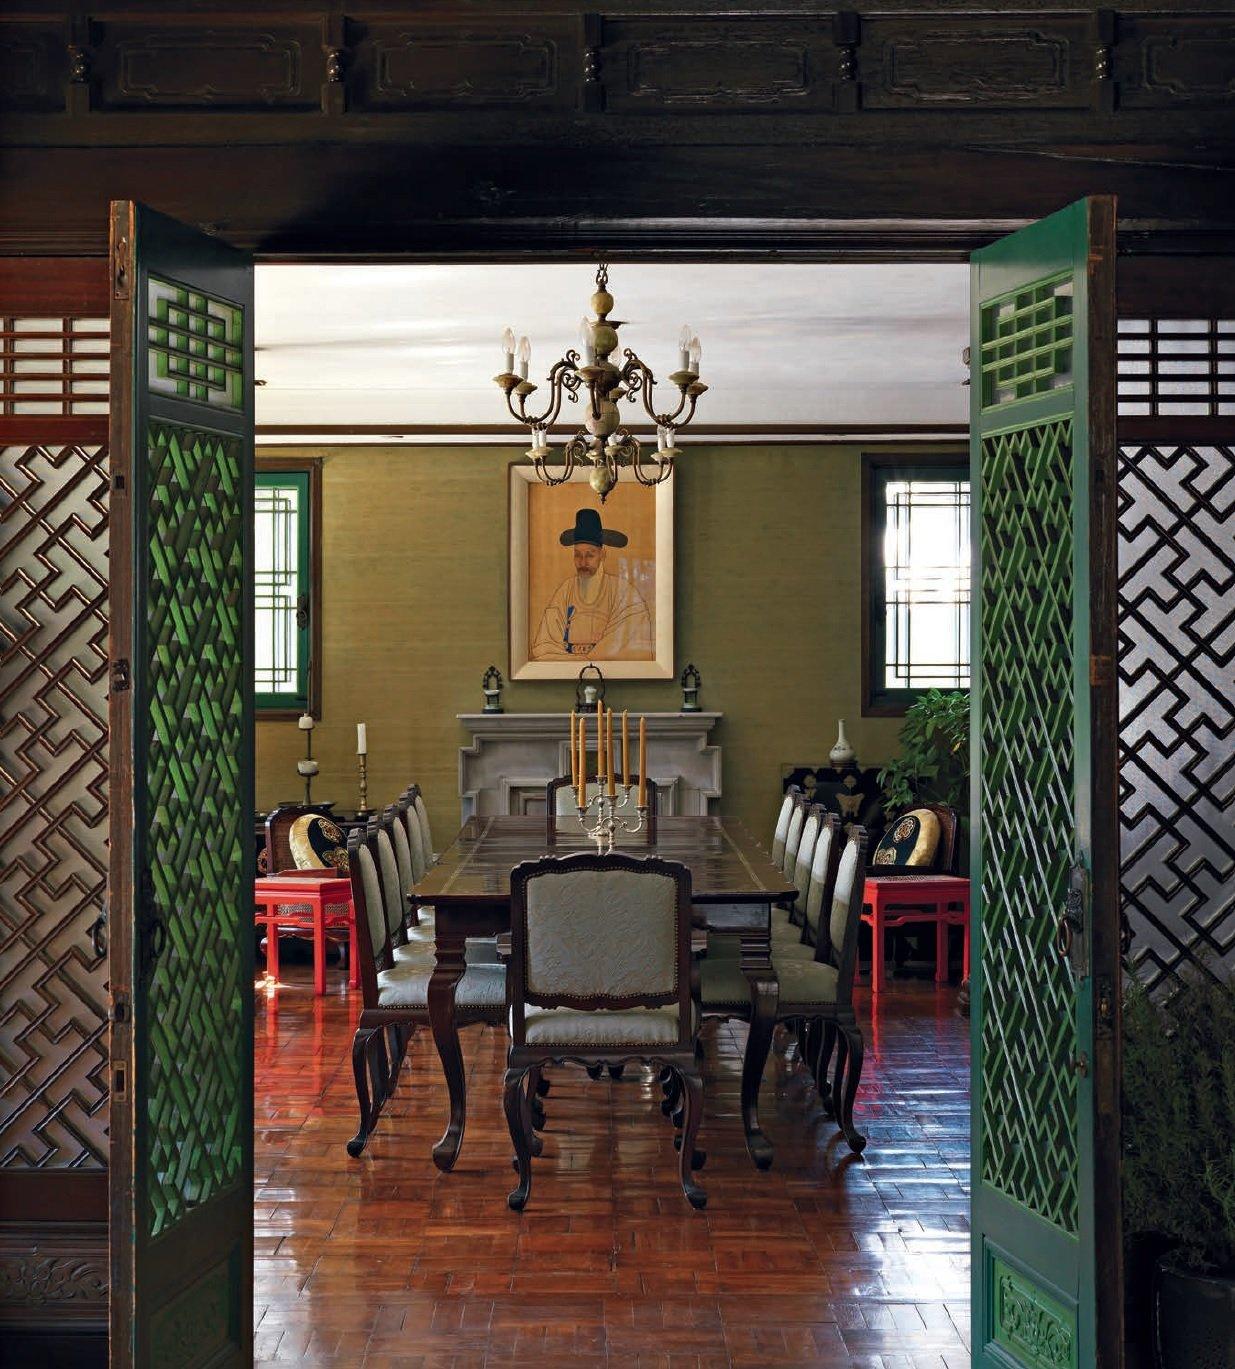 Hanok the korean house nani park robert j fouser jongkeun lee 9780804844673 amazon com books